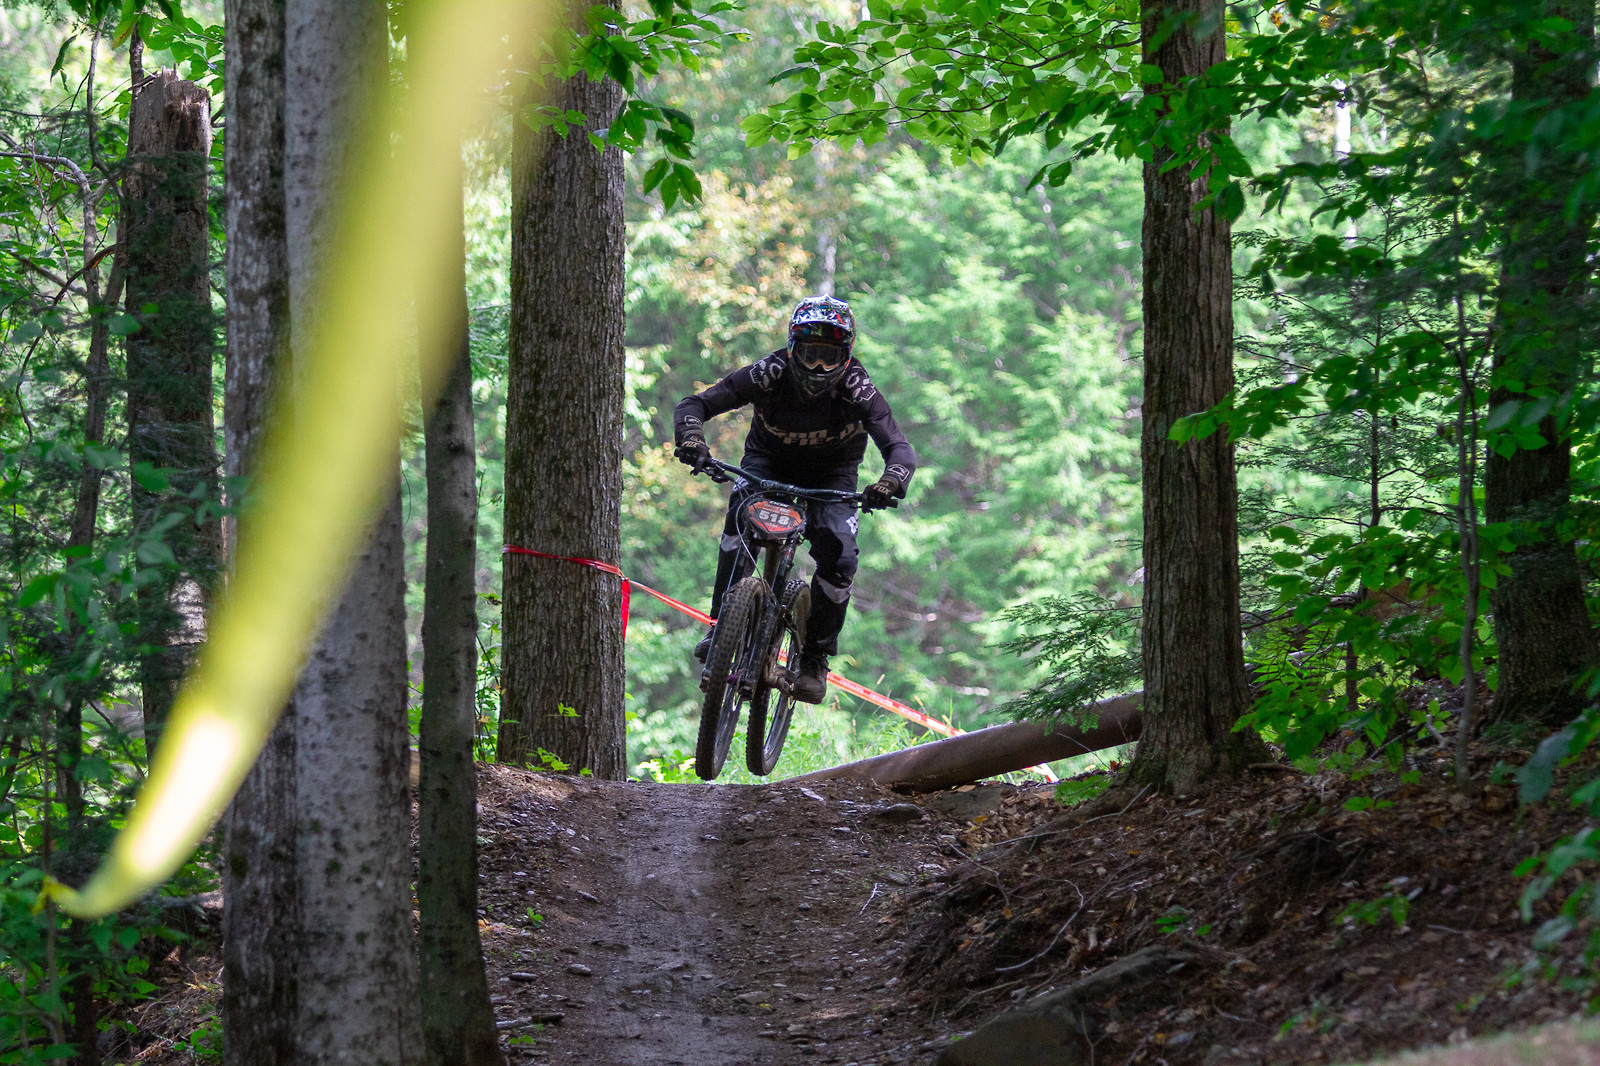 James Busse - JackRice - Mountain Biking Pictures - Vital MTB